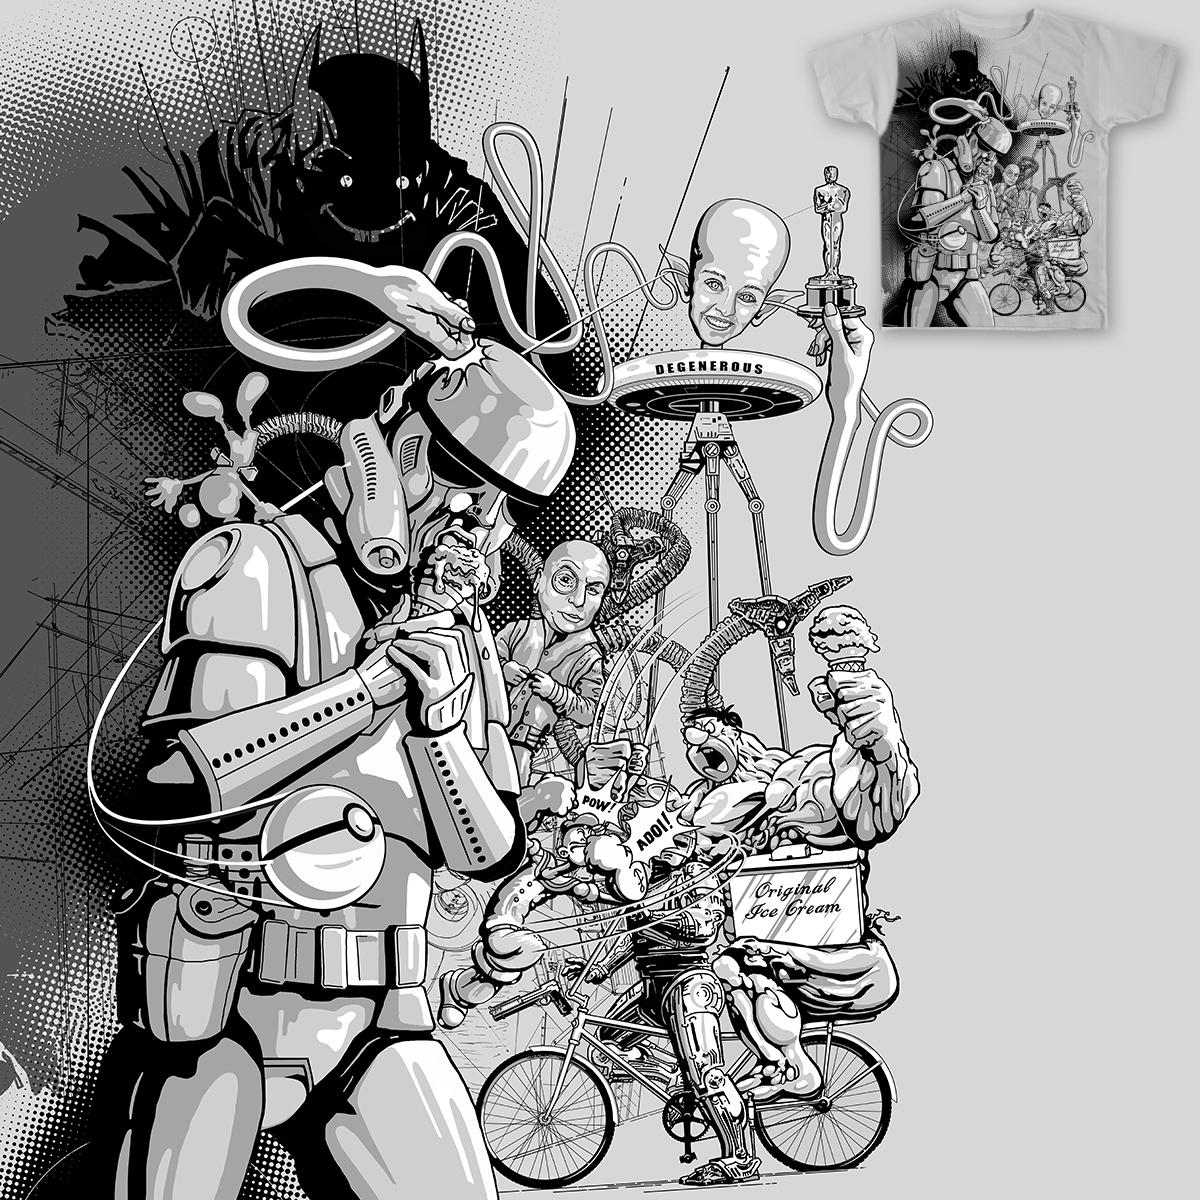 DEGENEROUS DAY by NARNIAZ on Threadless